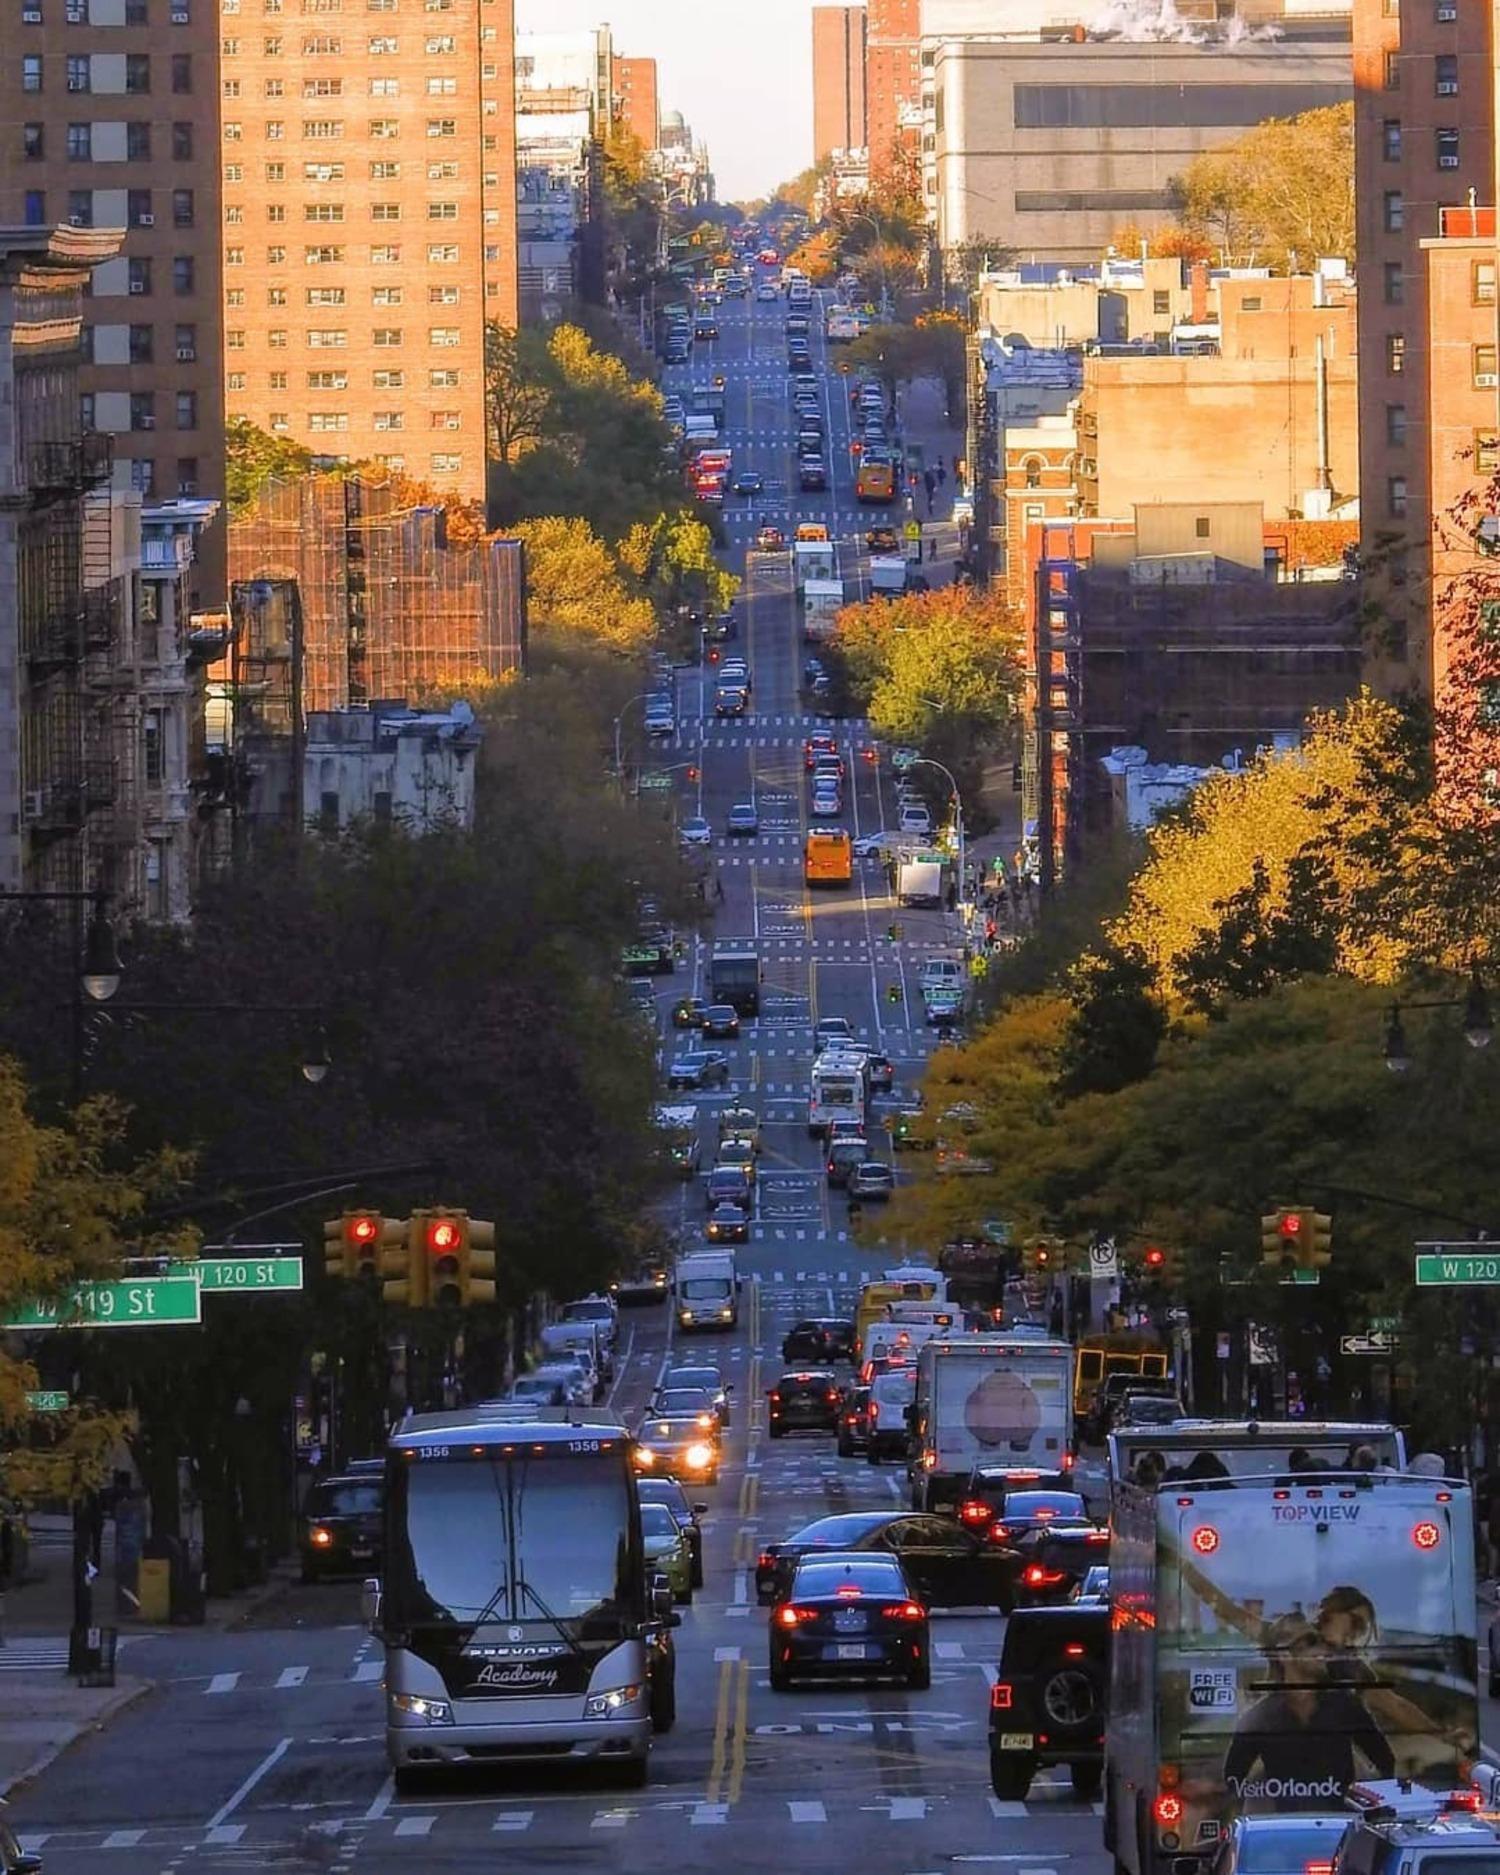 Amsterdam Avenue, Morningside Heights, Manhattan